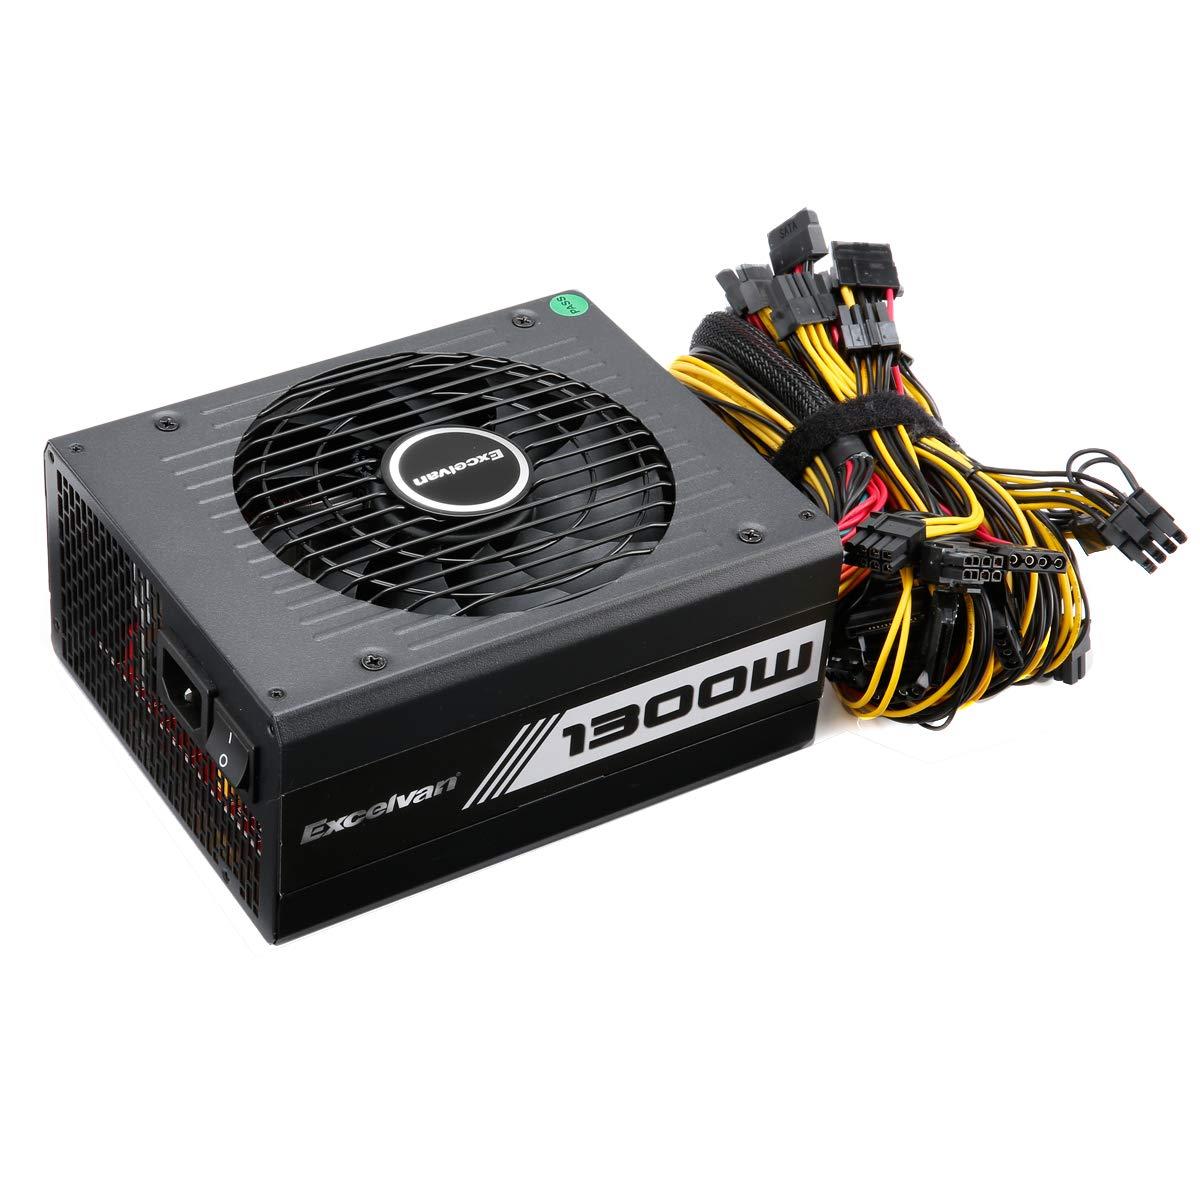 Excelvan Computer Modular Power Supply/PSU for PC/Desktop/ Gaming Computer,1300 Watt 80+ Bronze Certified PSU with Silent Fan,3-Year Warranty